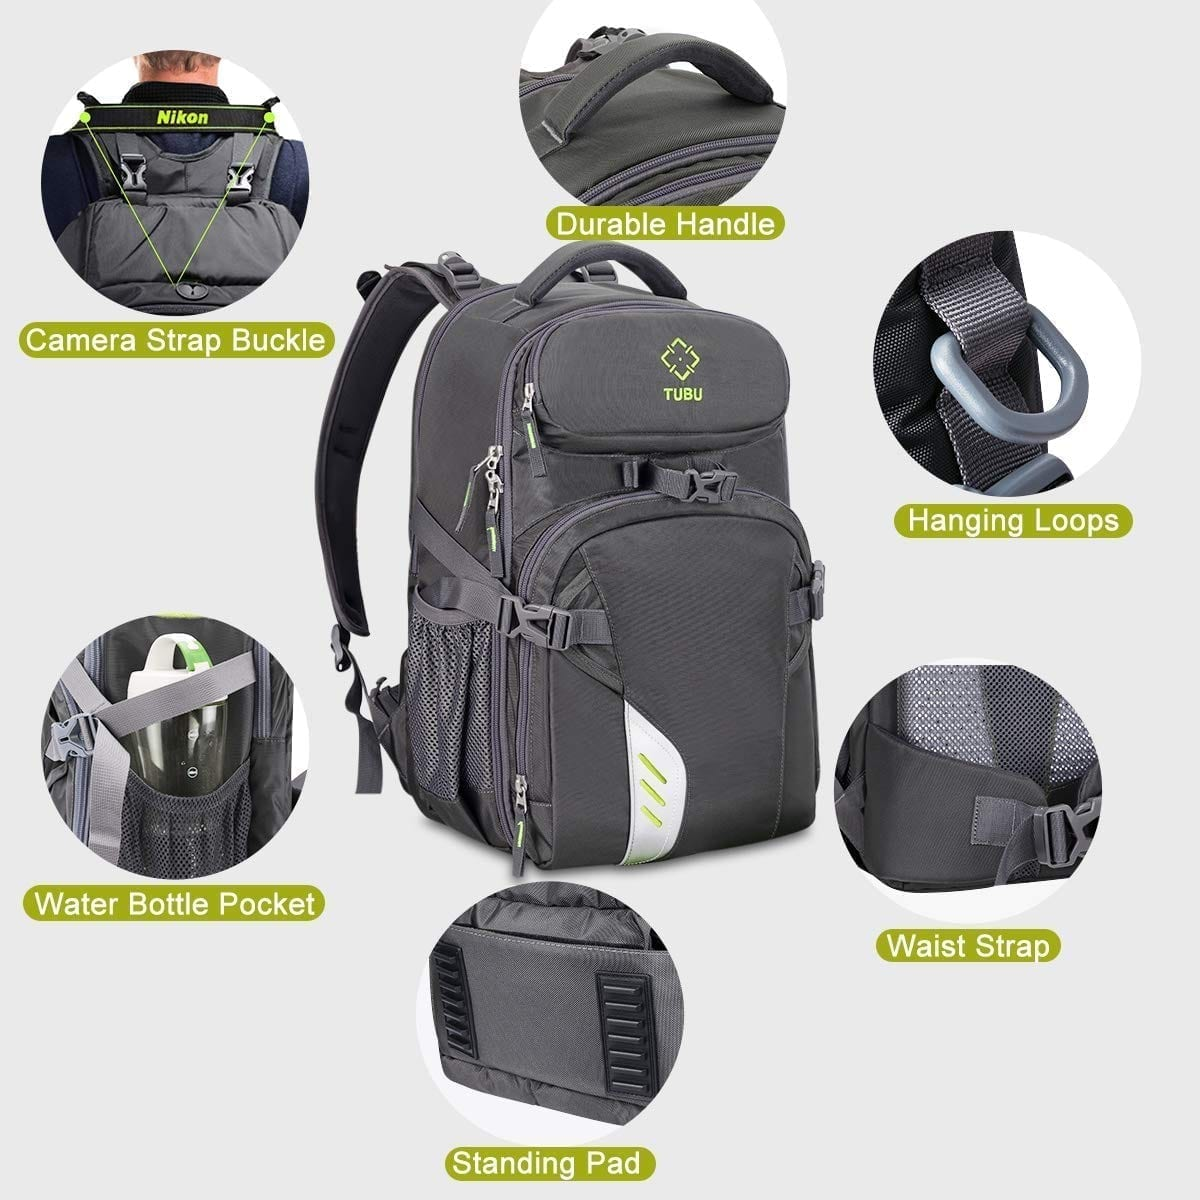 TUBU Video Camera Backpack Fit